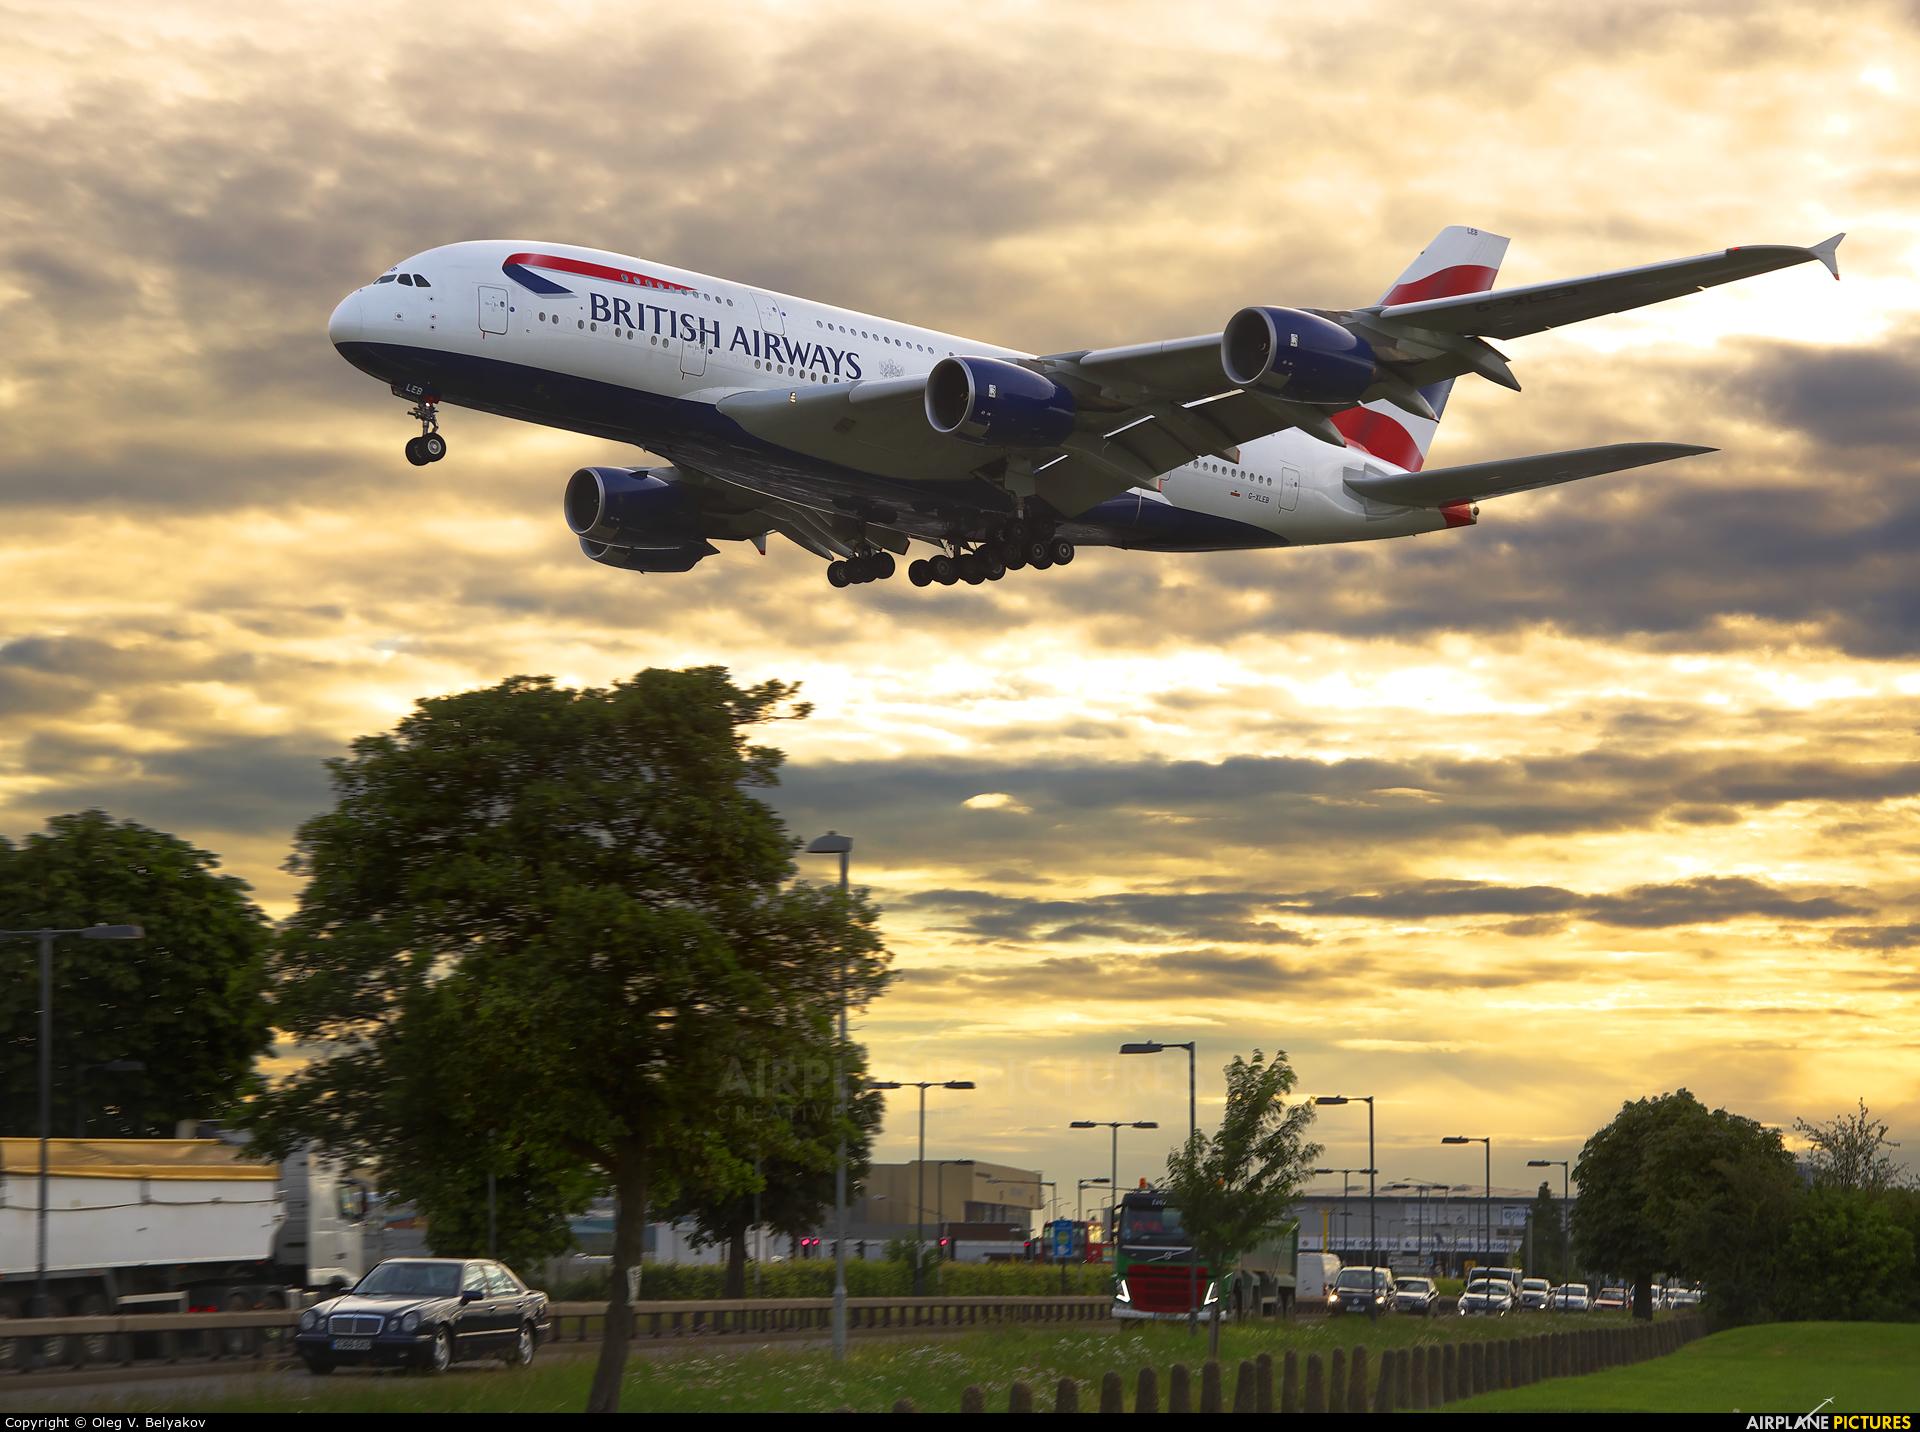 British Airways G-XLEB aircraft at London - Heathrow